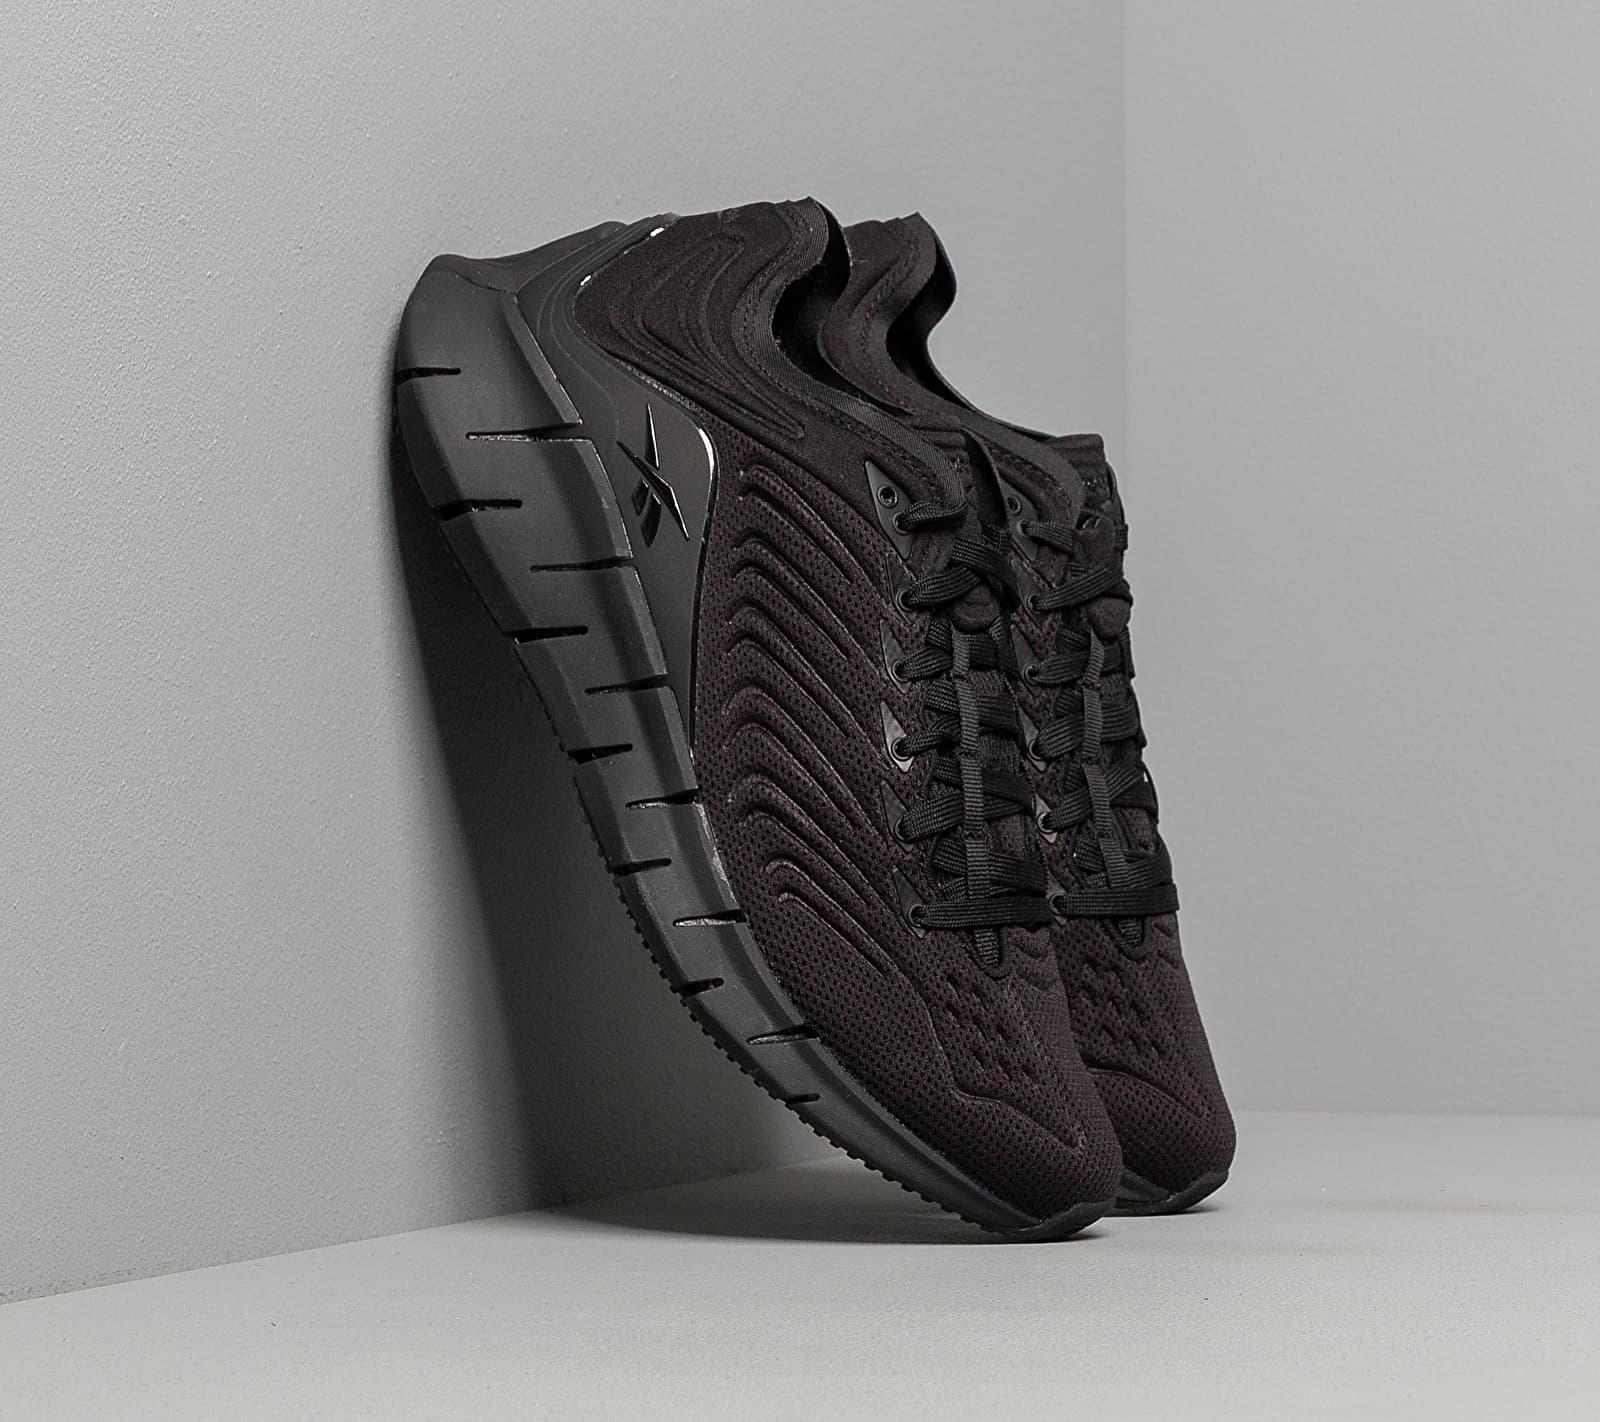 Reebok Zig Kinetica Black/ Black/ True Grey 7 EUR 37.5